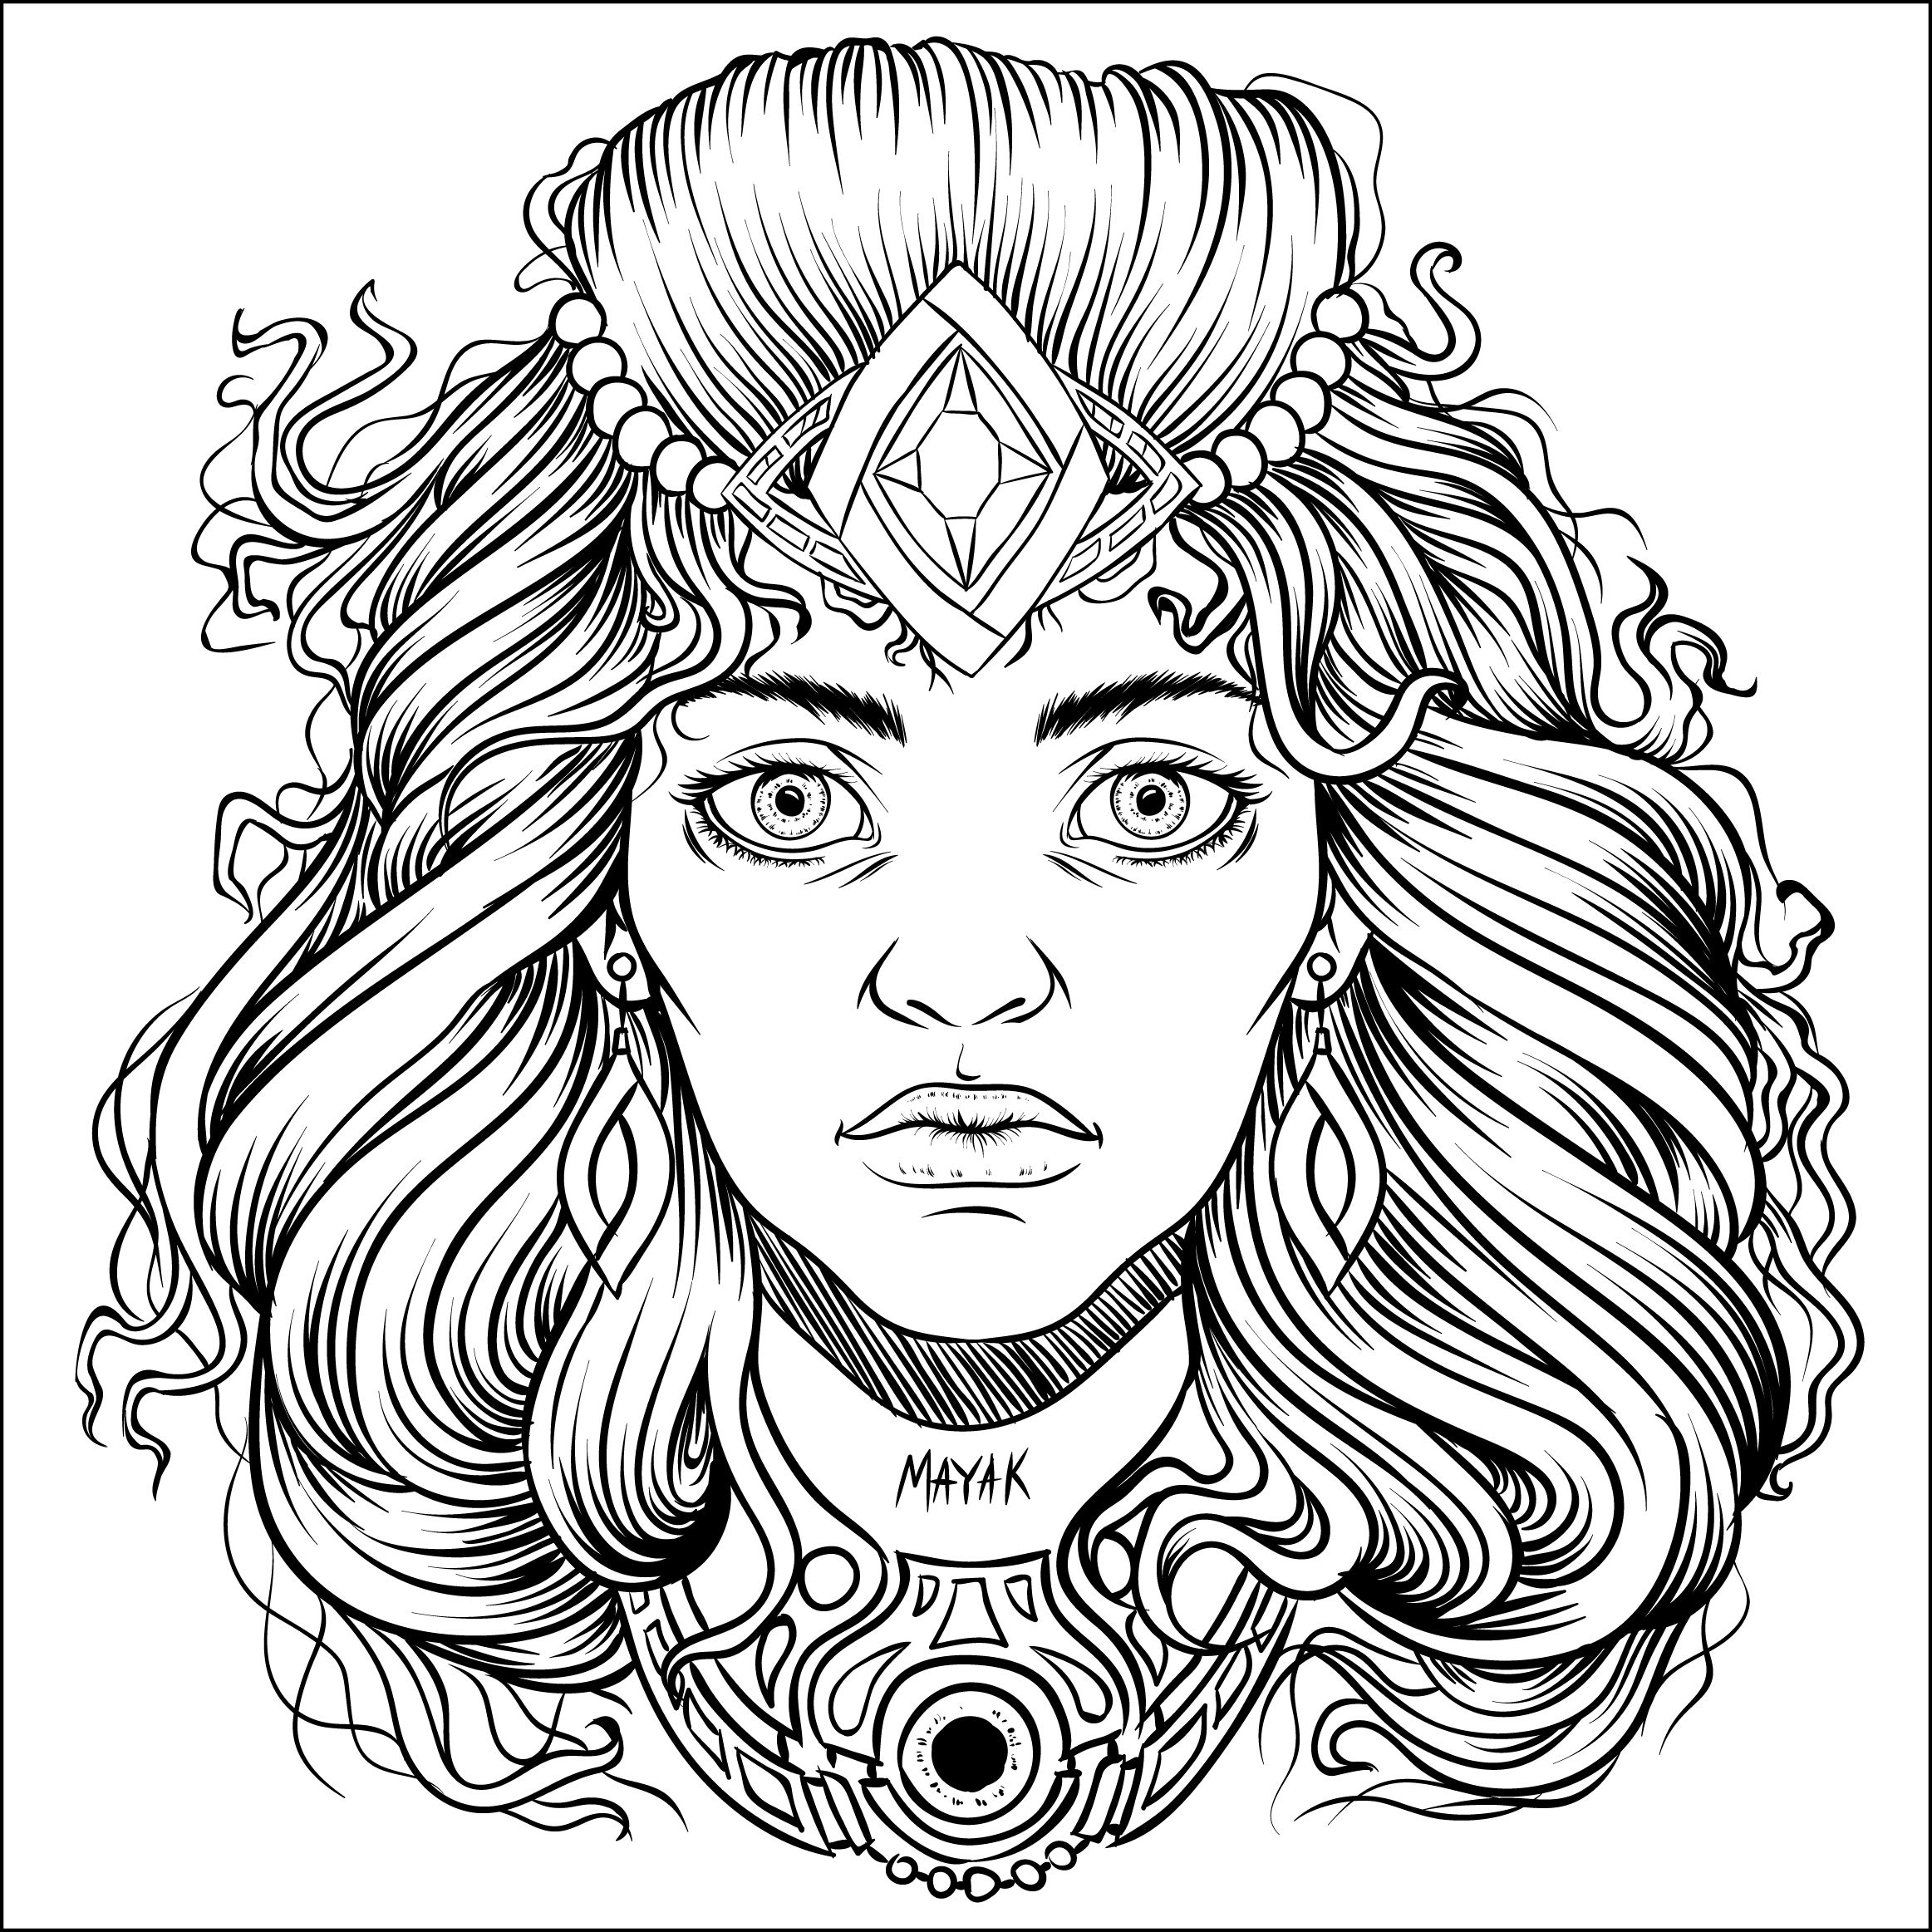 Sketch Tattoo Girl Woman Hair Beautiful Art Line Vector Draw Drawing Illustrator Illustration Skull Coloring Pages Coloring Pages Colouring Pages